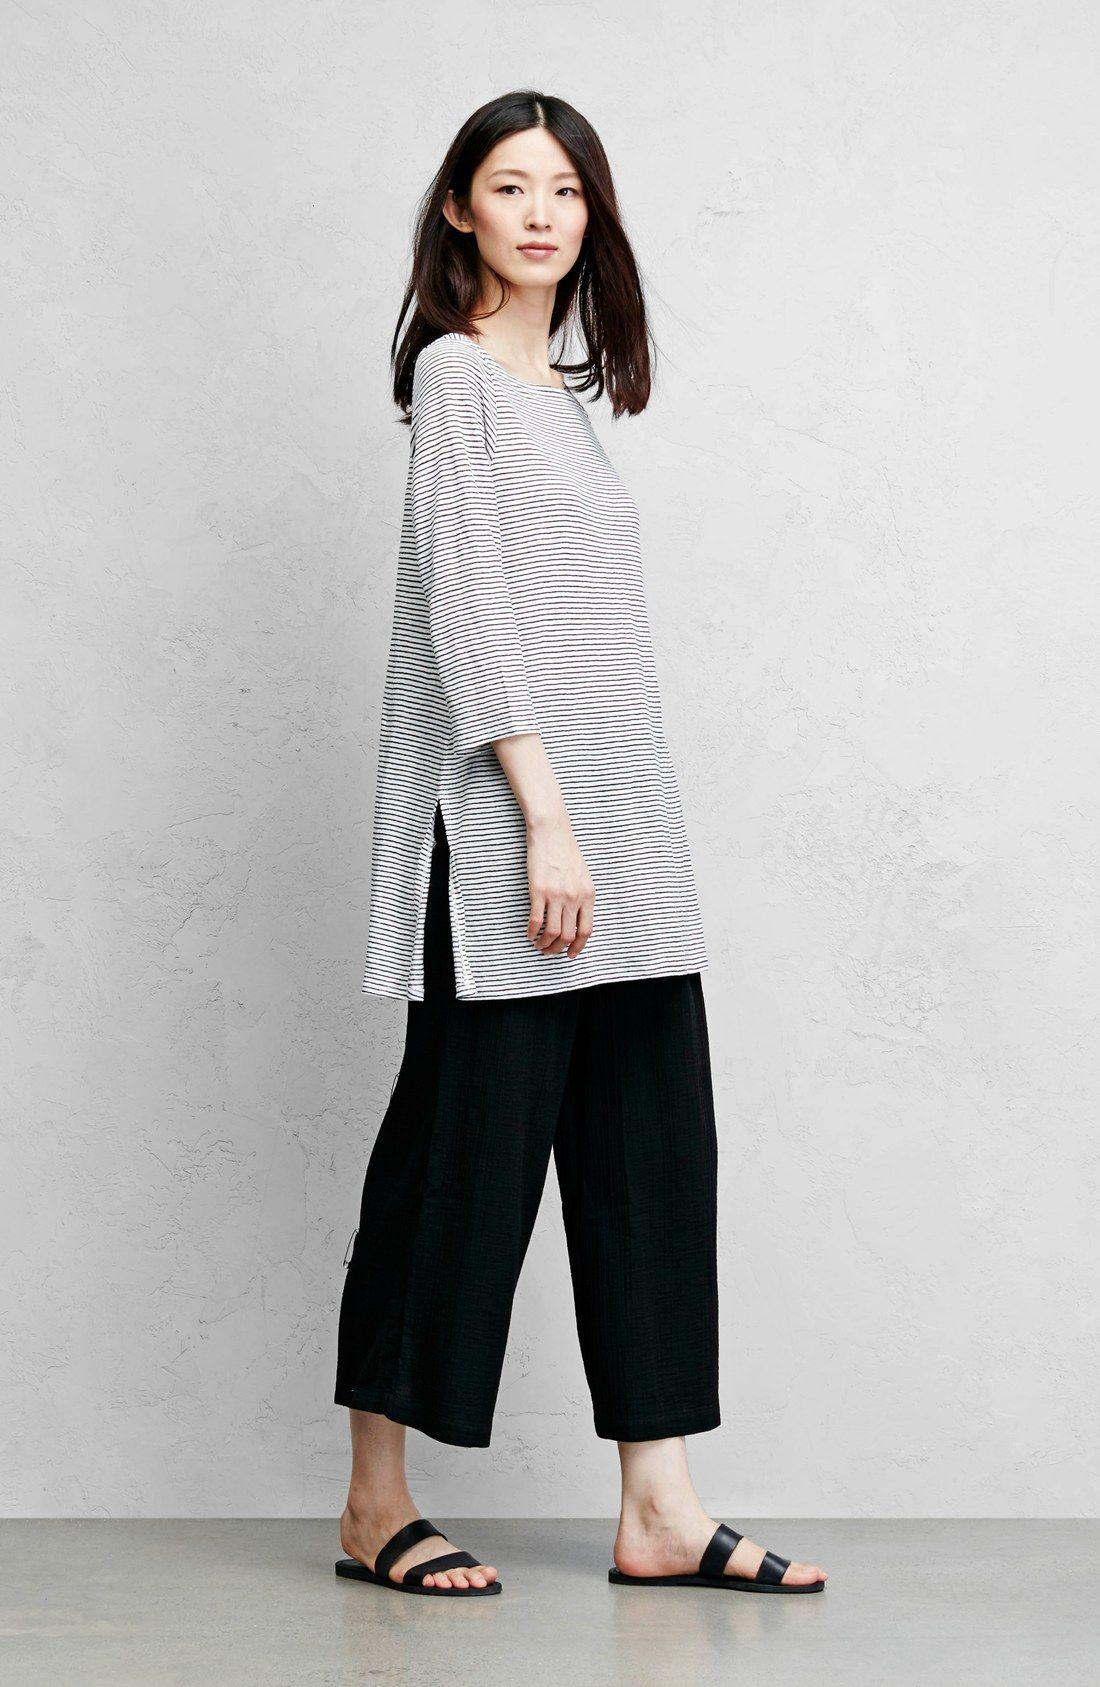 Eileen Fisher Tunic & Pants | traje con blusón | Pinterest | Moda ...